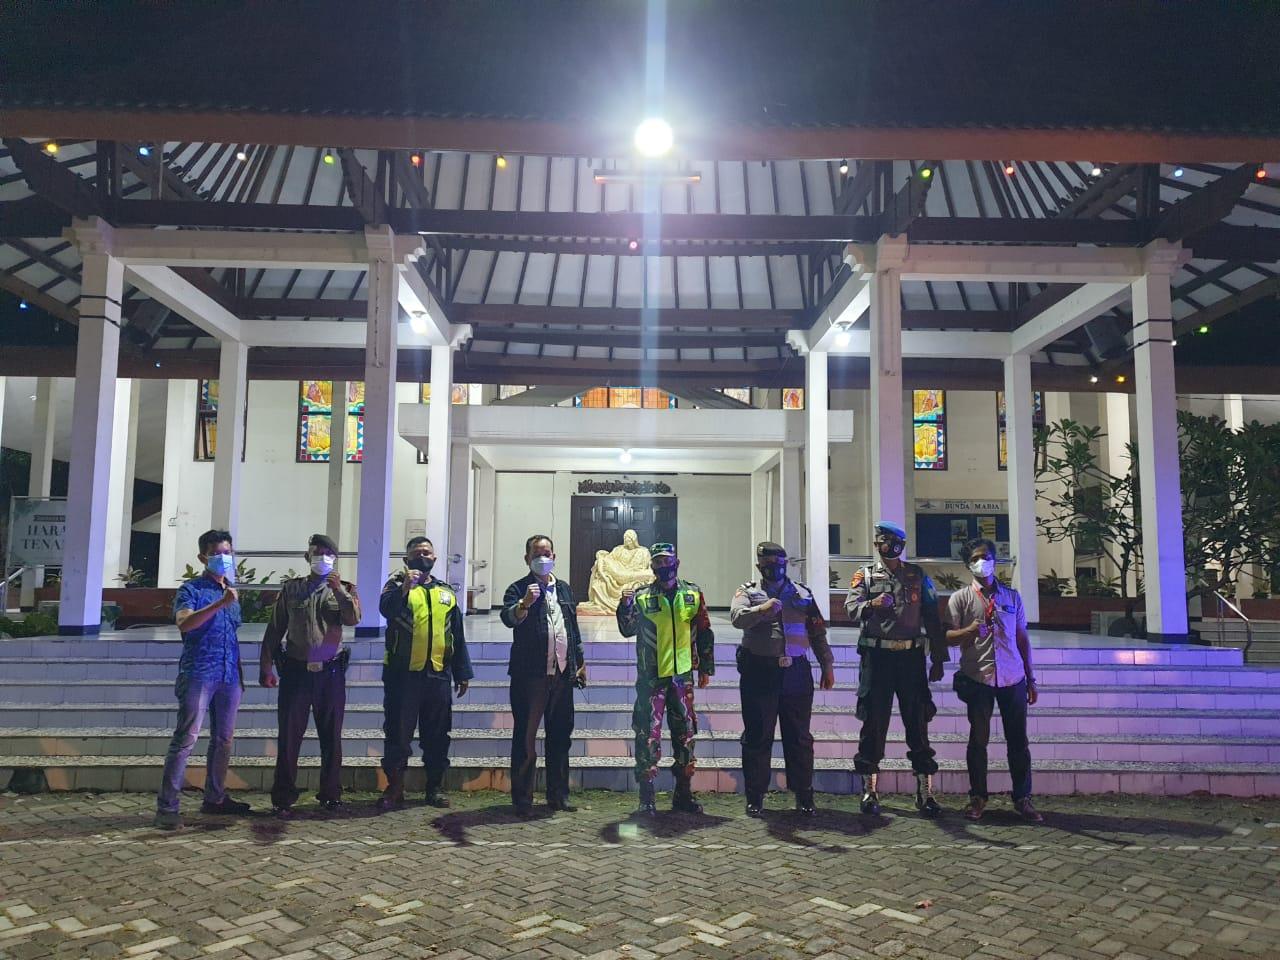 Patroli Gabungan TNI - Polri Sisir Gereja Wilkum Polres Ciko